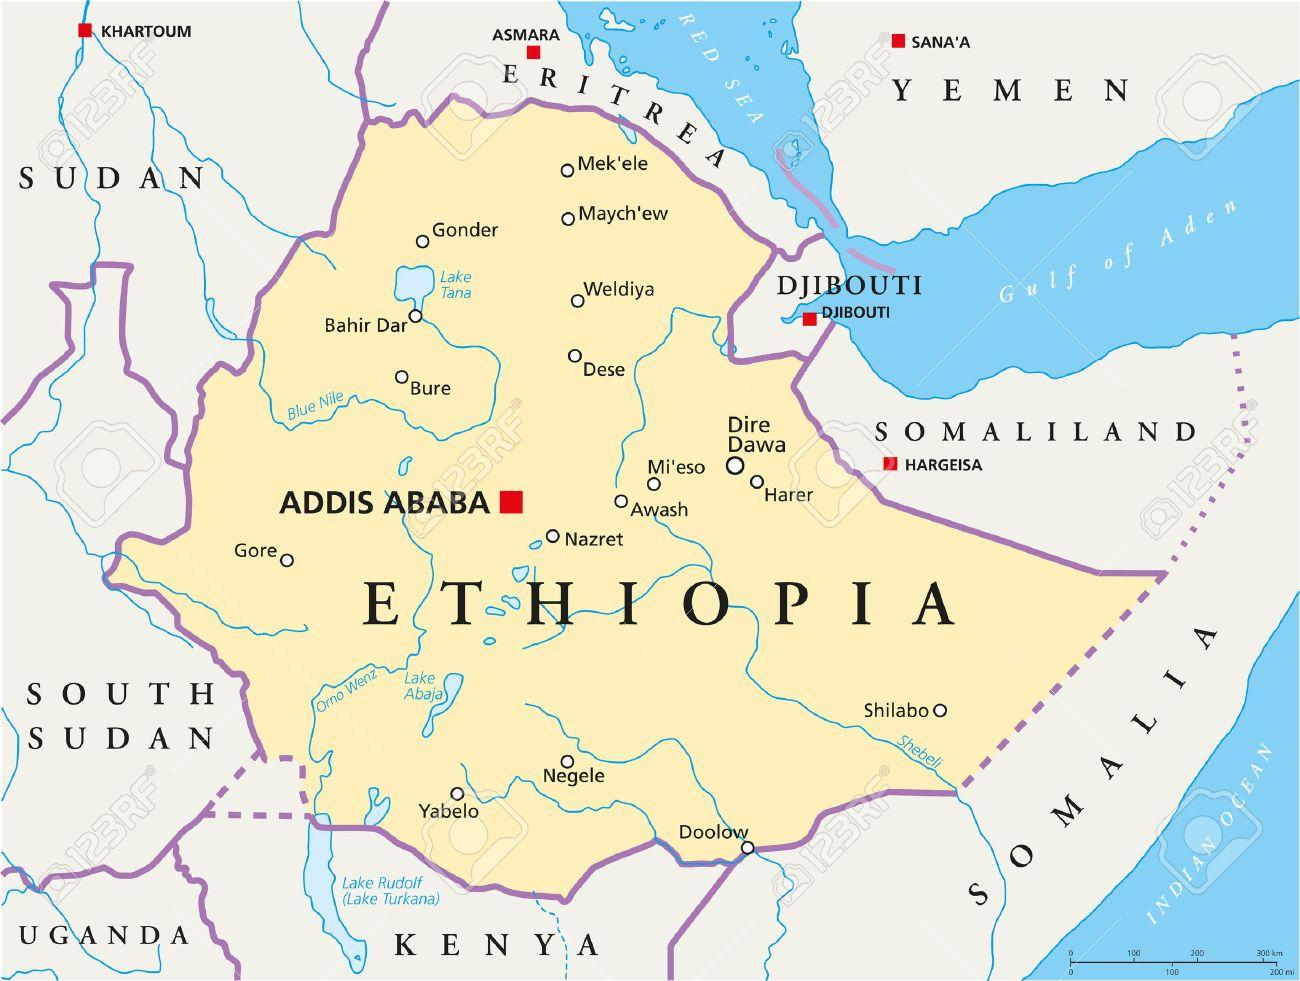 Addis Ababa Ethiopia Map Ethiopia Political Map With Capital Addis Ababa, National Borders